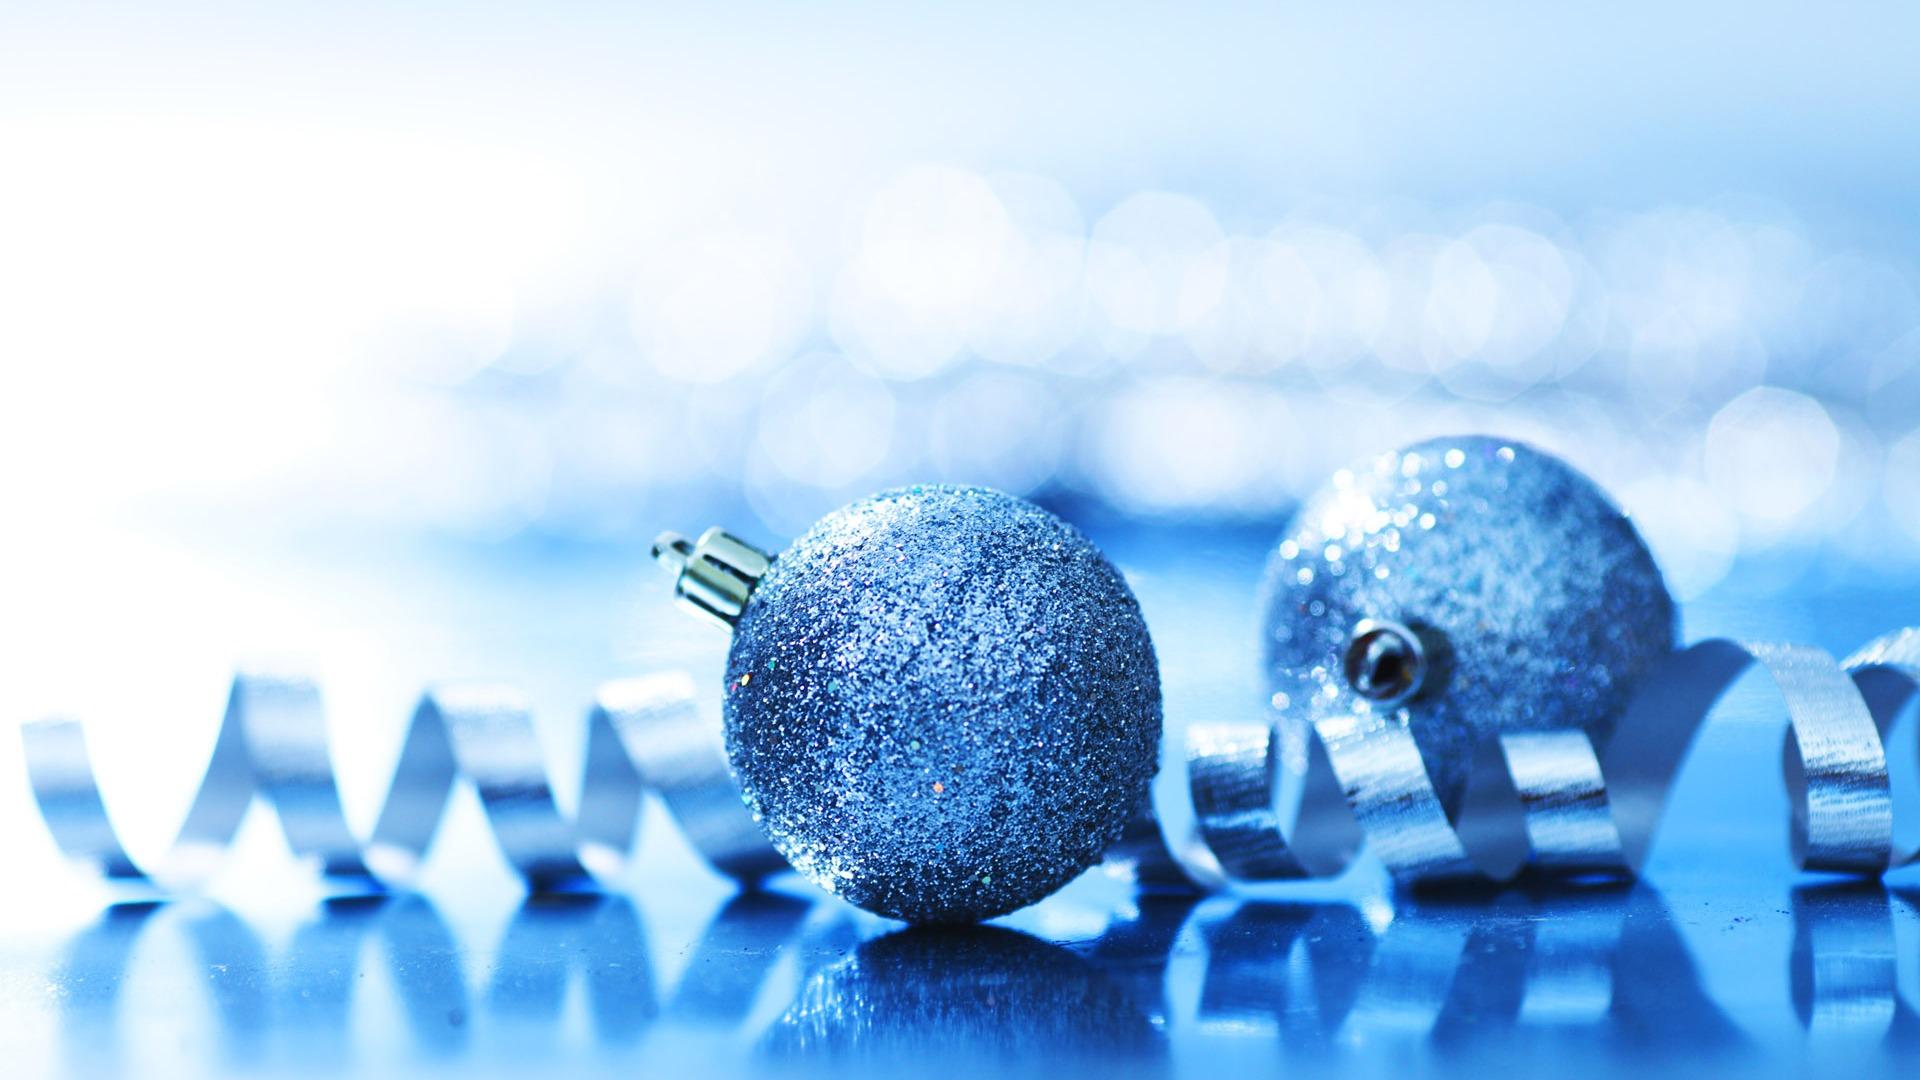 Weihnachtskugeln tapete 2 11 1920x1080 wallpaper herunterladen weihnachtskugeln tapete 2 - Blaue christbaumkugeln ...